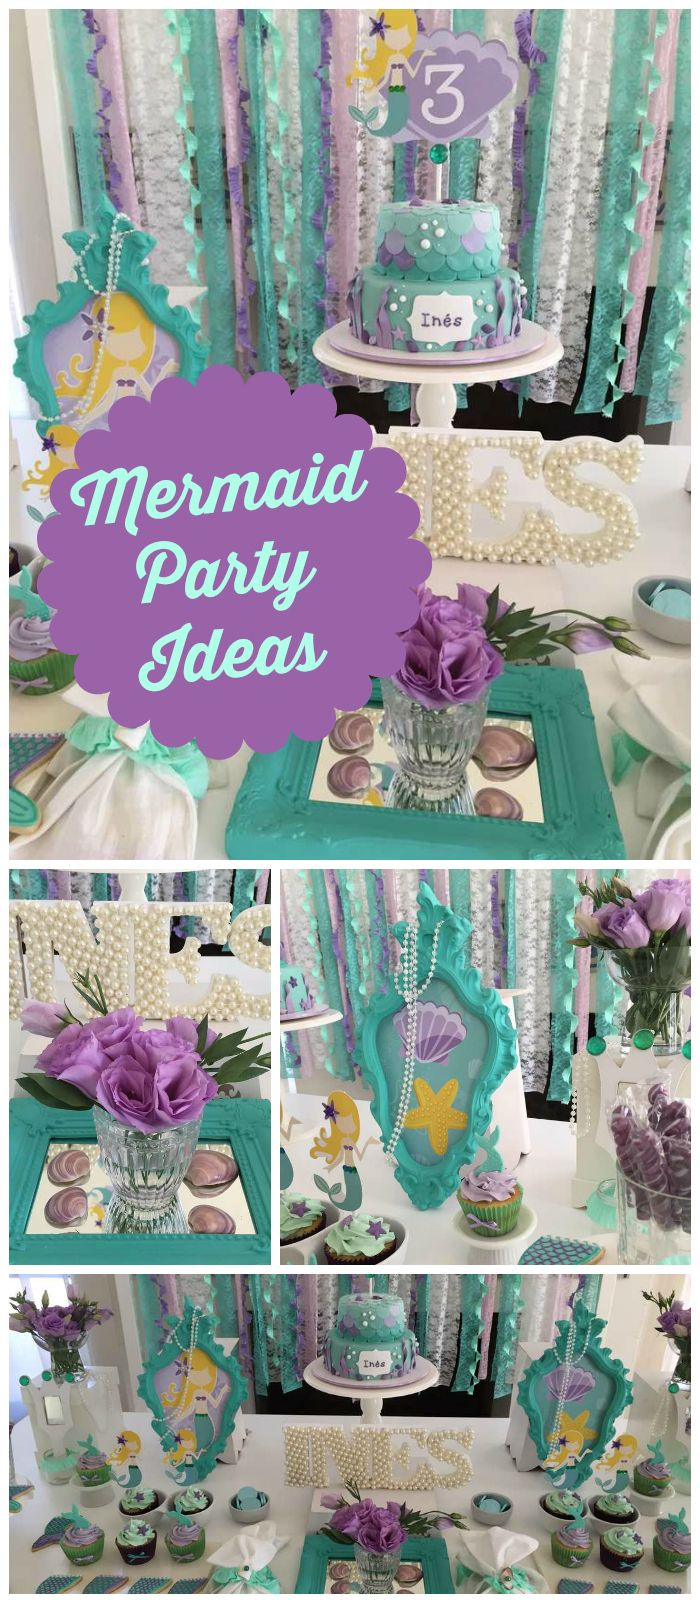 M 225 s de 1000 ideas sobre decoraciones de fiesta de safari en pinterest - I M Loving This Mermaid Party With A Teal And Purple Color Scheme See